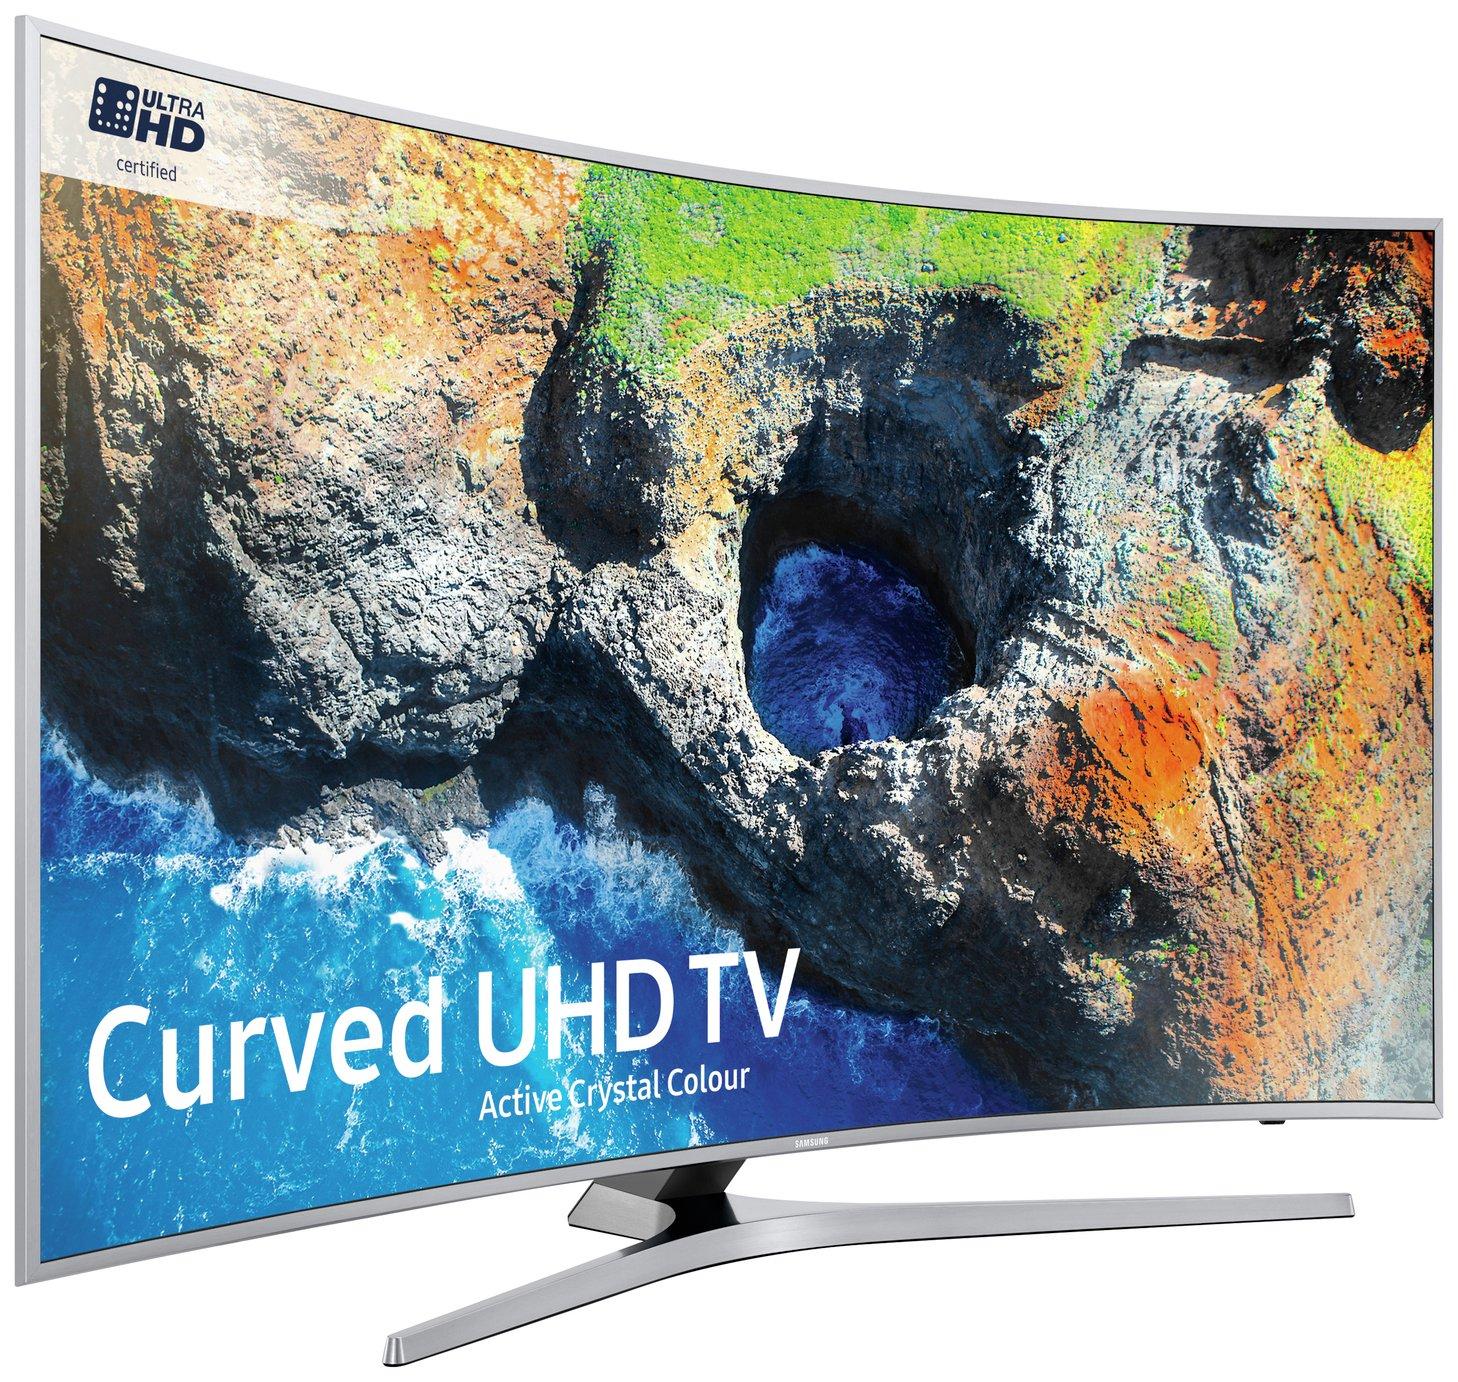 Samsung Samsung 55 Inch 55MU6500 Curved 4K Ultra HD LED HDR Smart TV